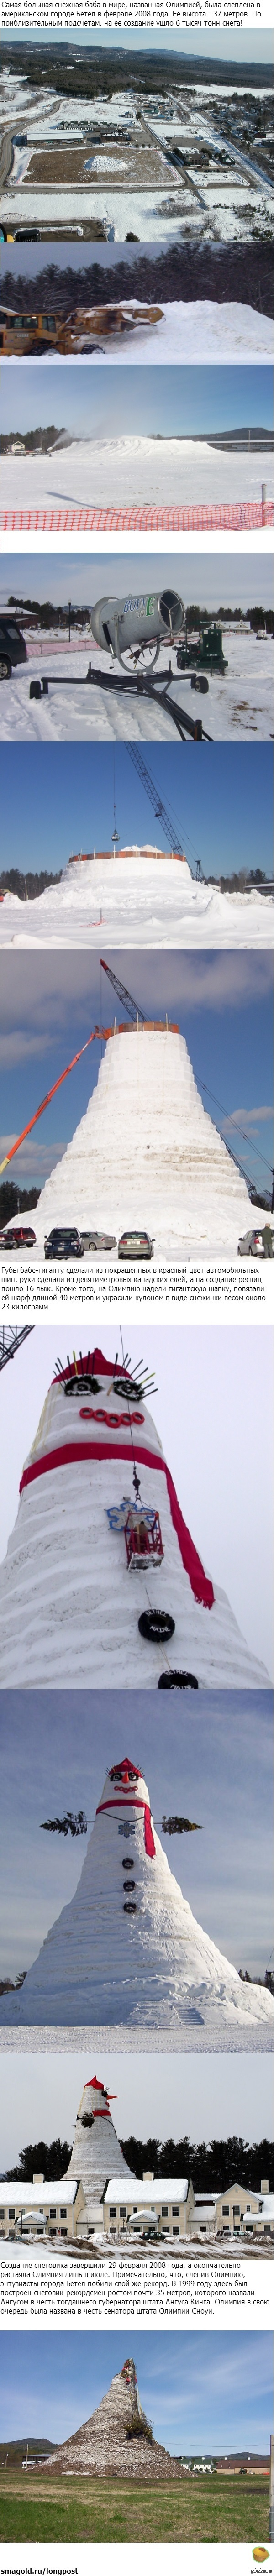 Самая гигантская Снежная Баба